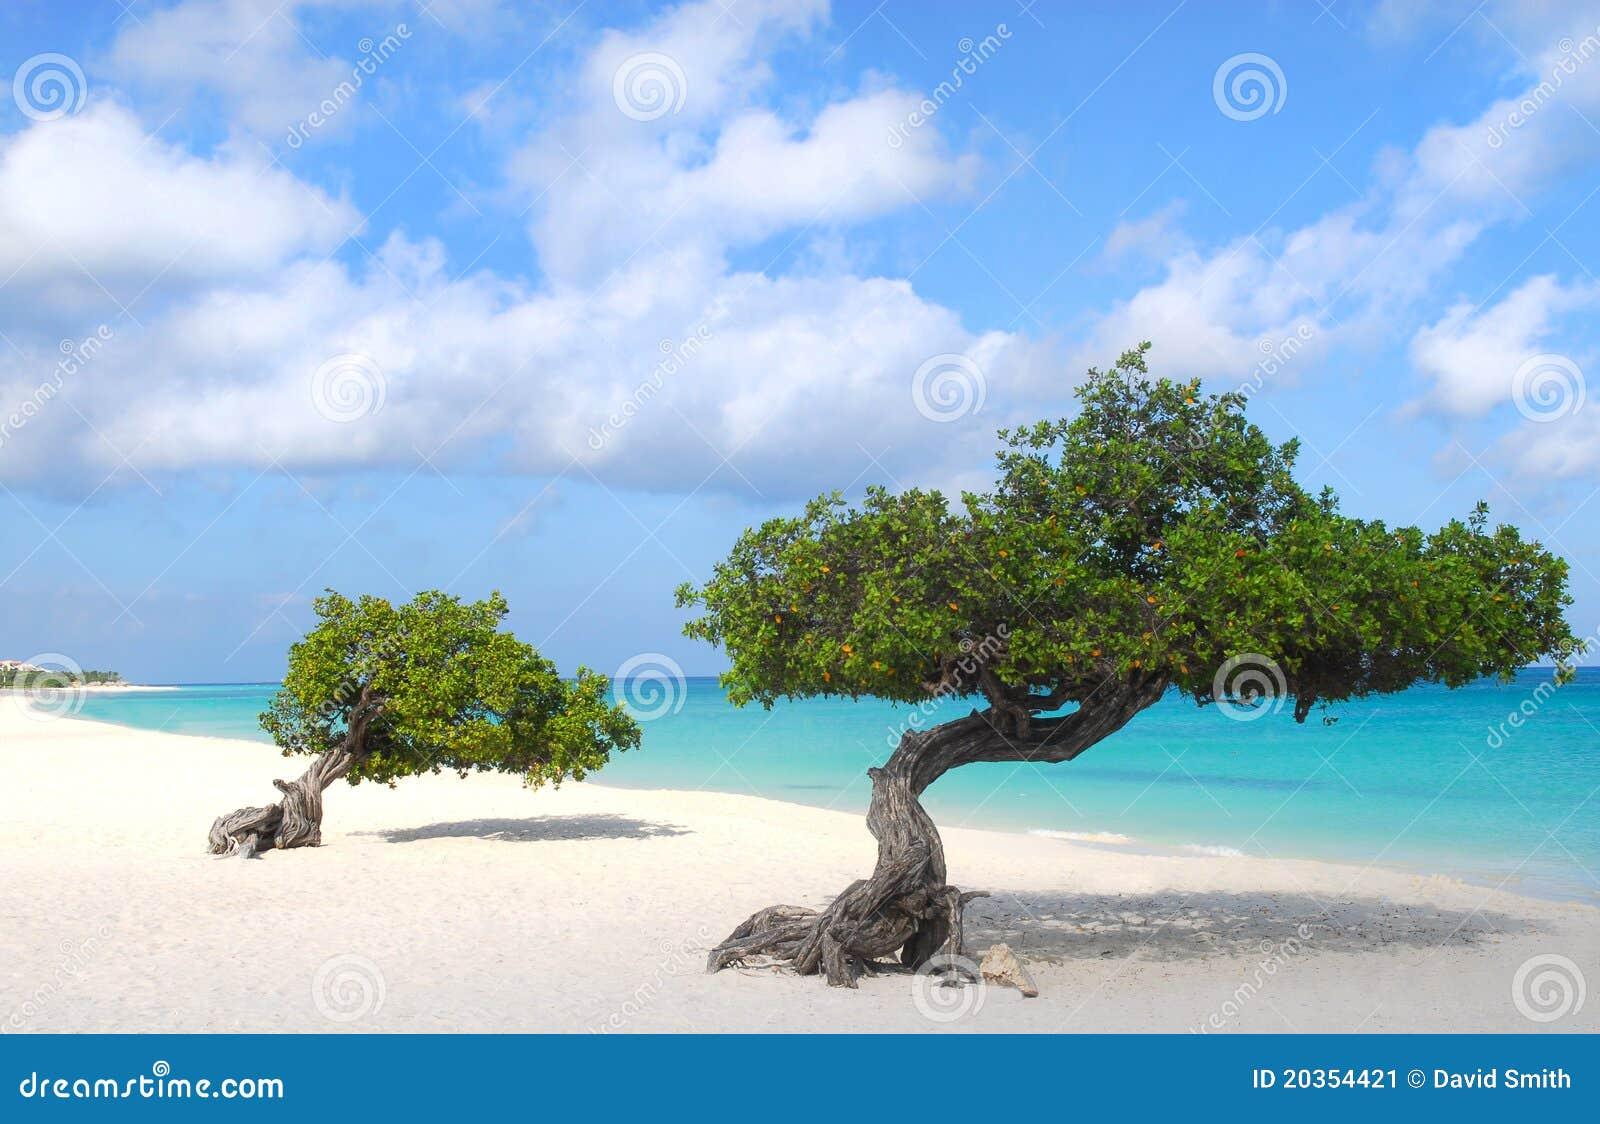 Divi divi trees on eagle beach in aruba stock image - Divi beach aruba ...